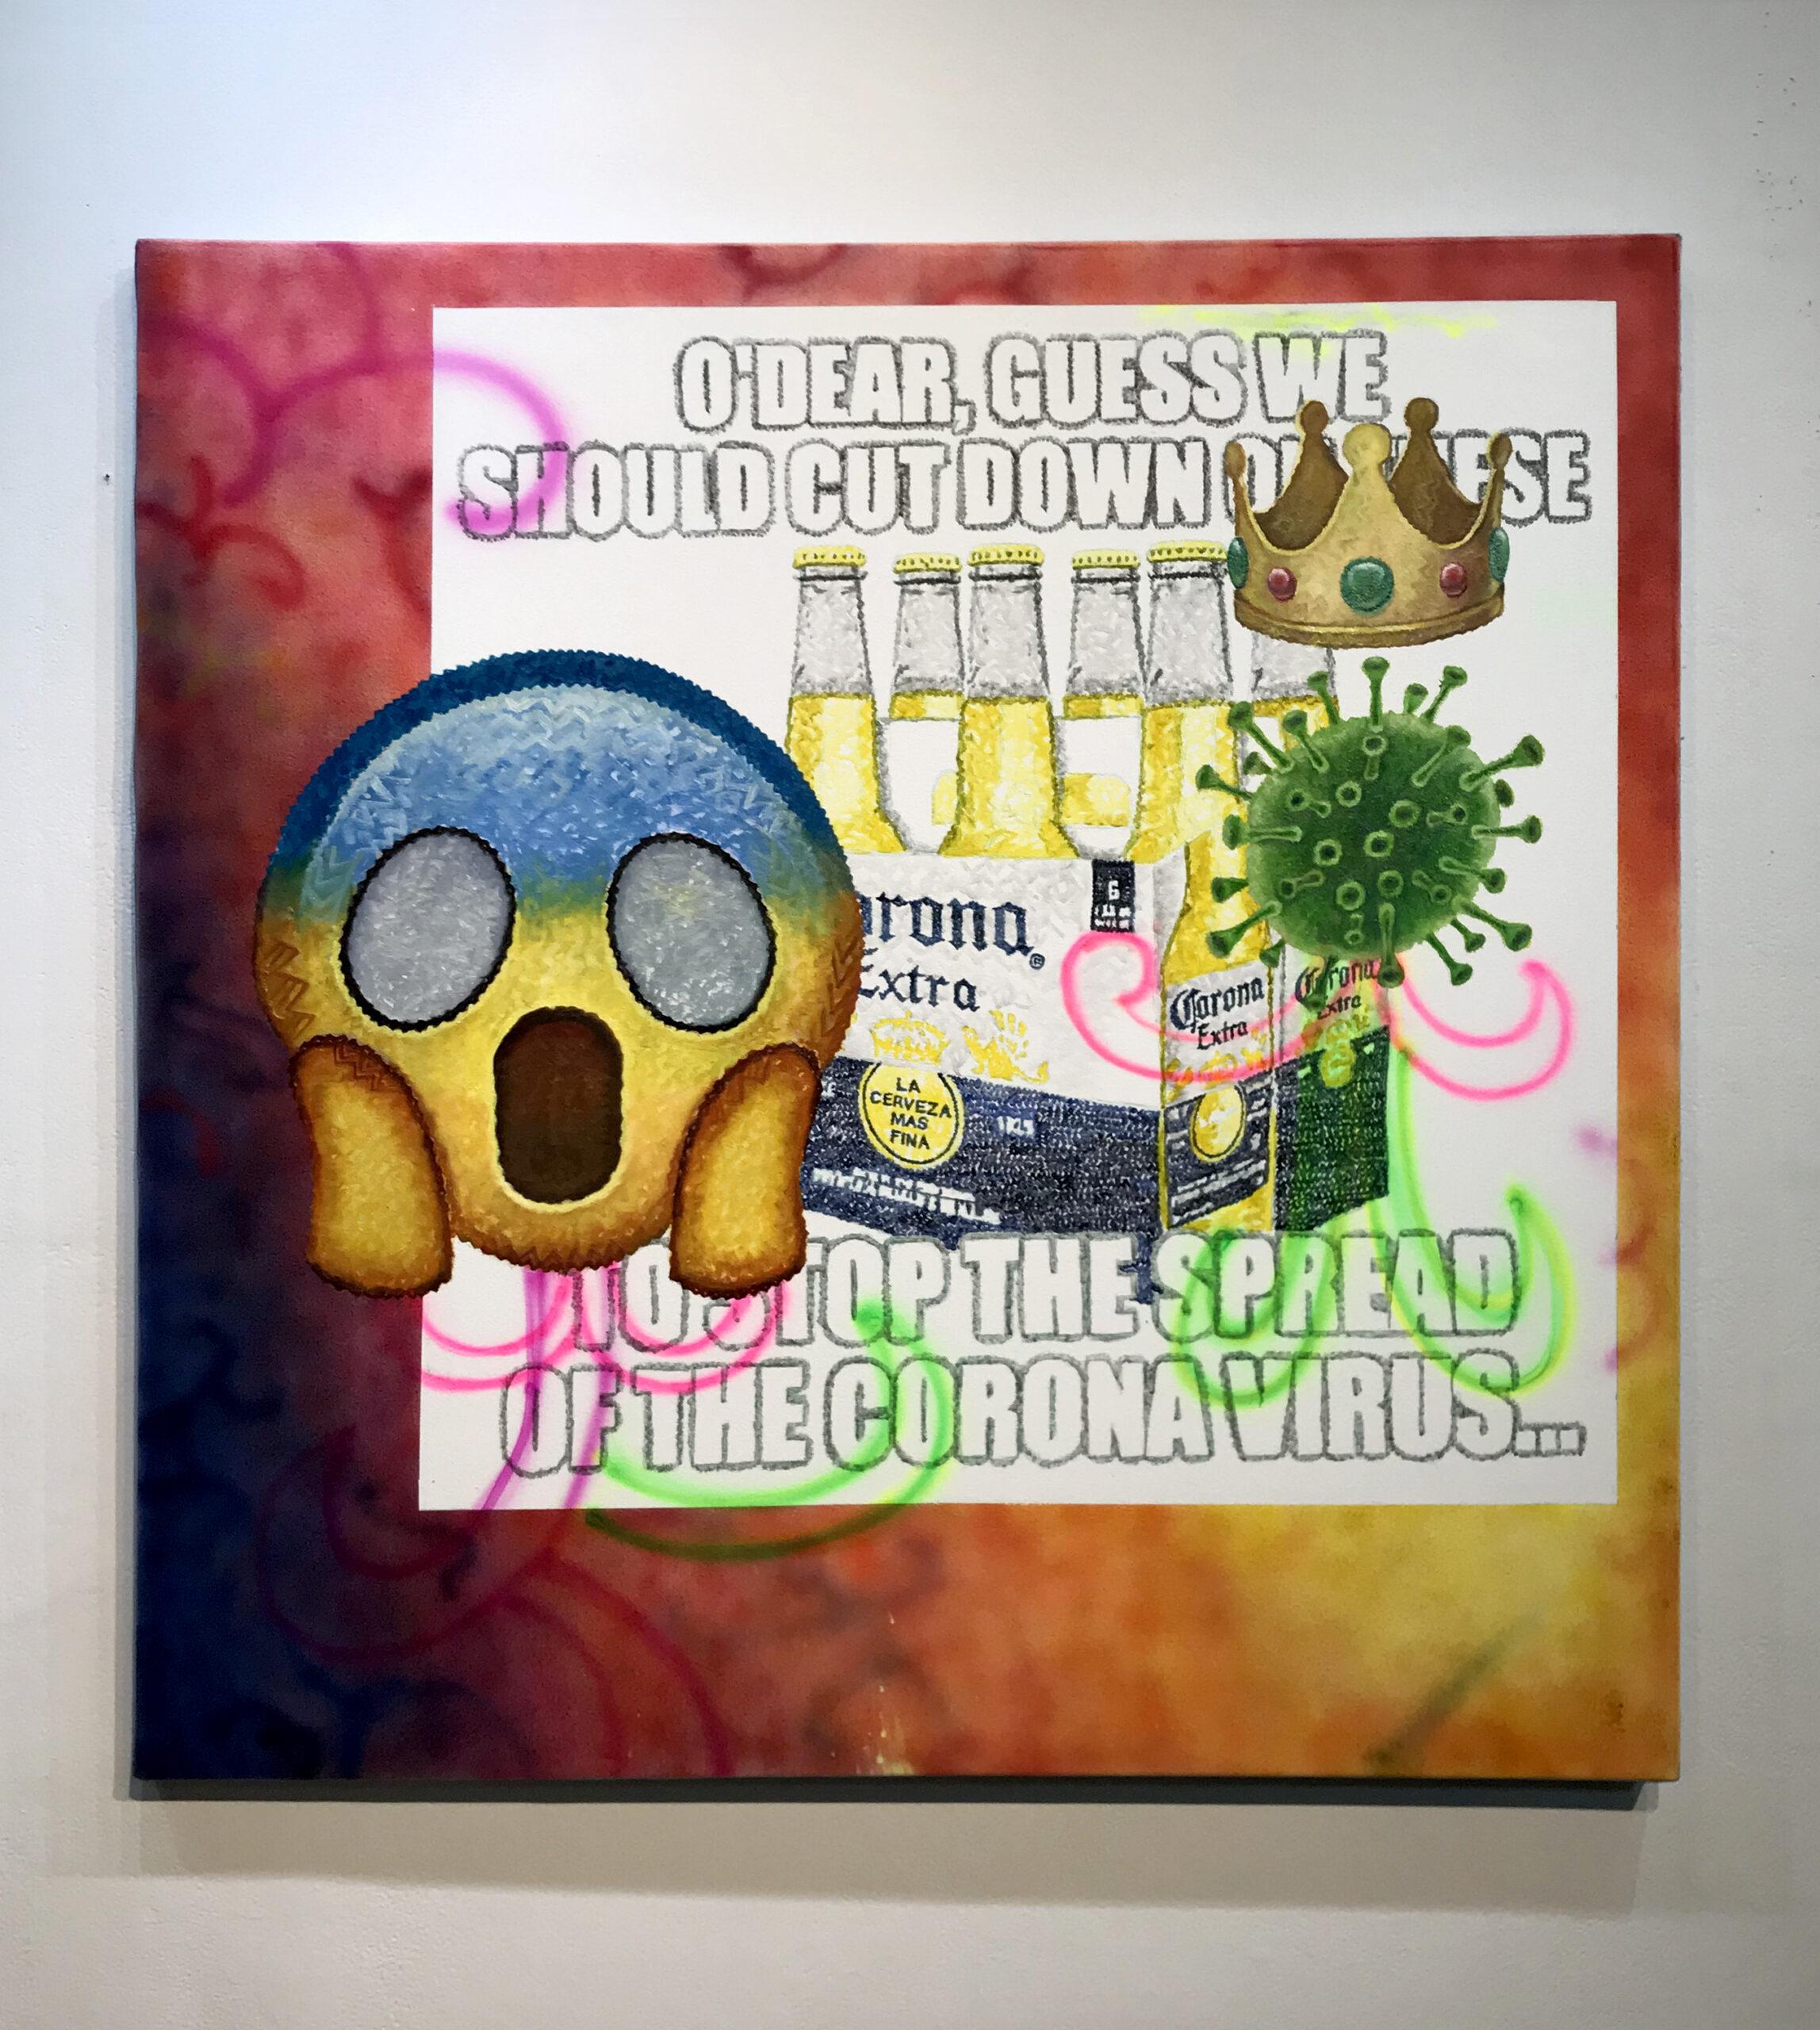 9. Corona meme + The Scream